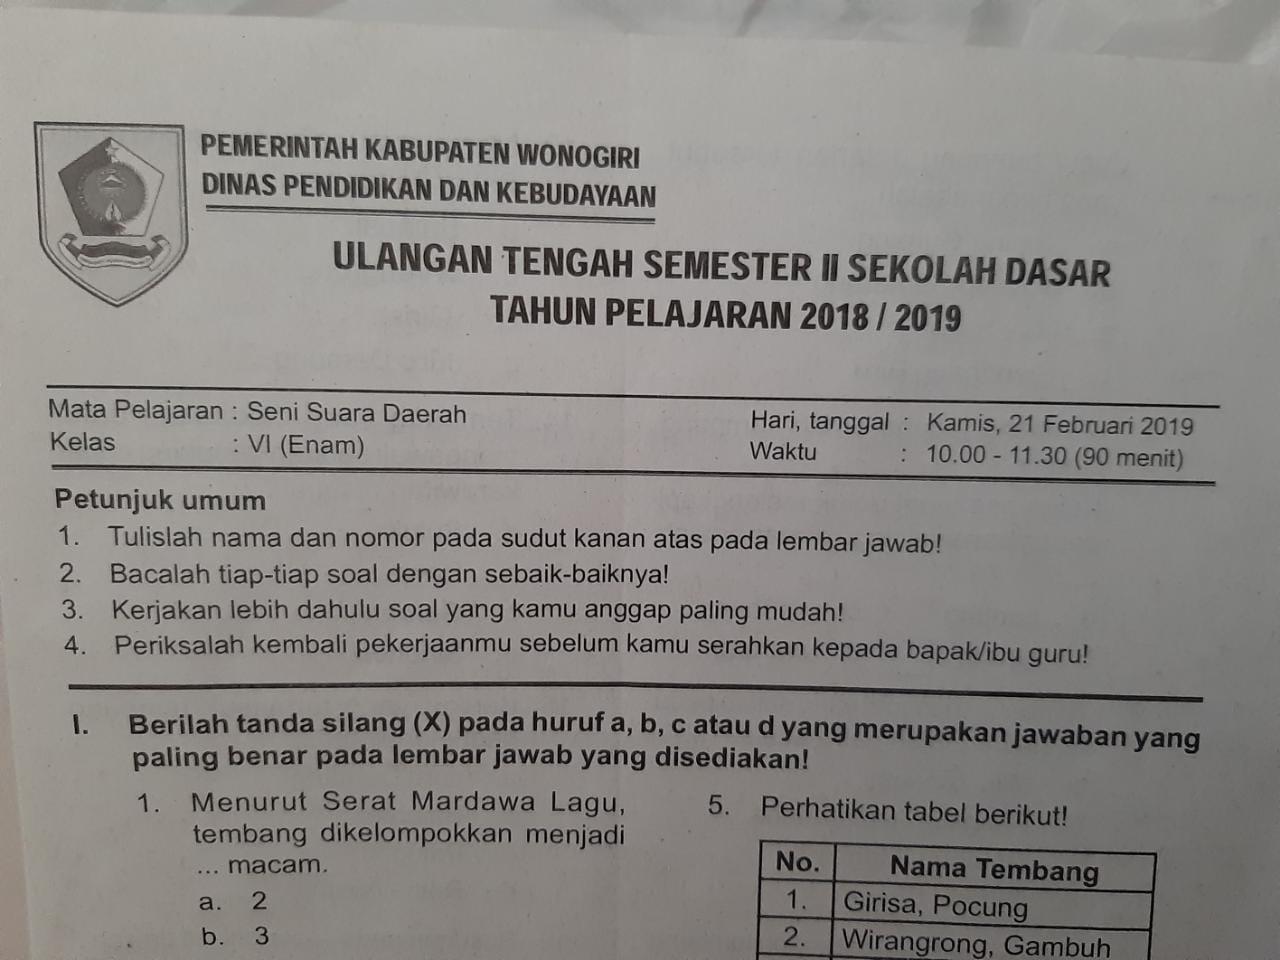 Soal Uts Ssd Kelas 6 Semester 2 Tahun Ajaran 2018 2019 Sekolah Dasar Islam